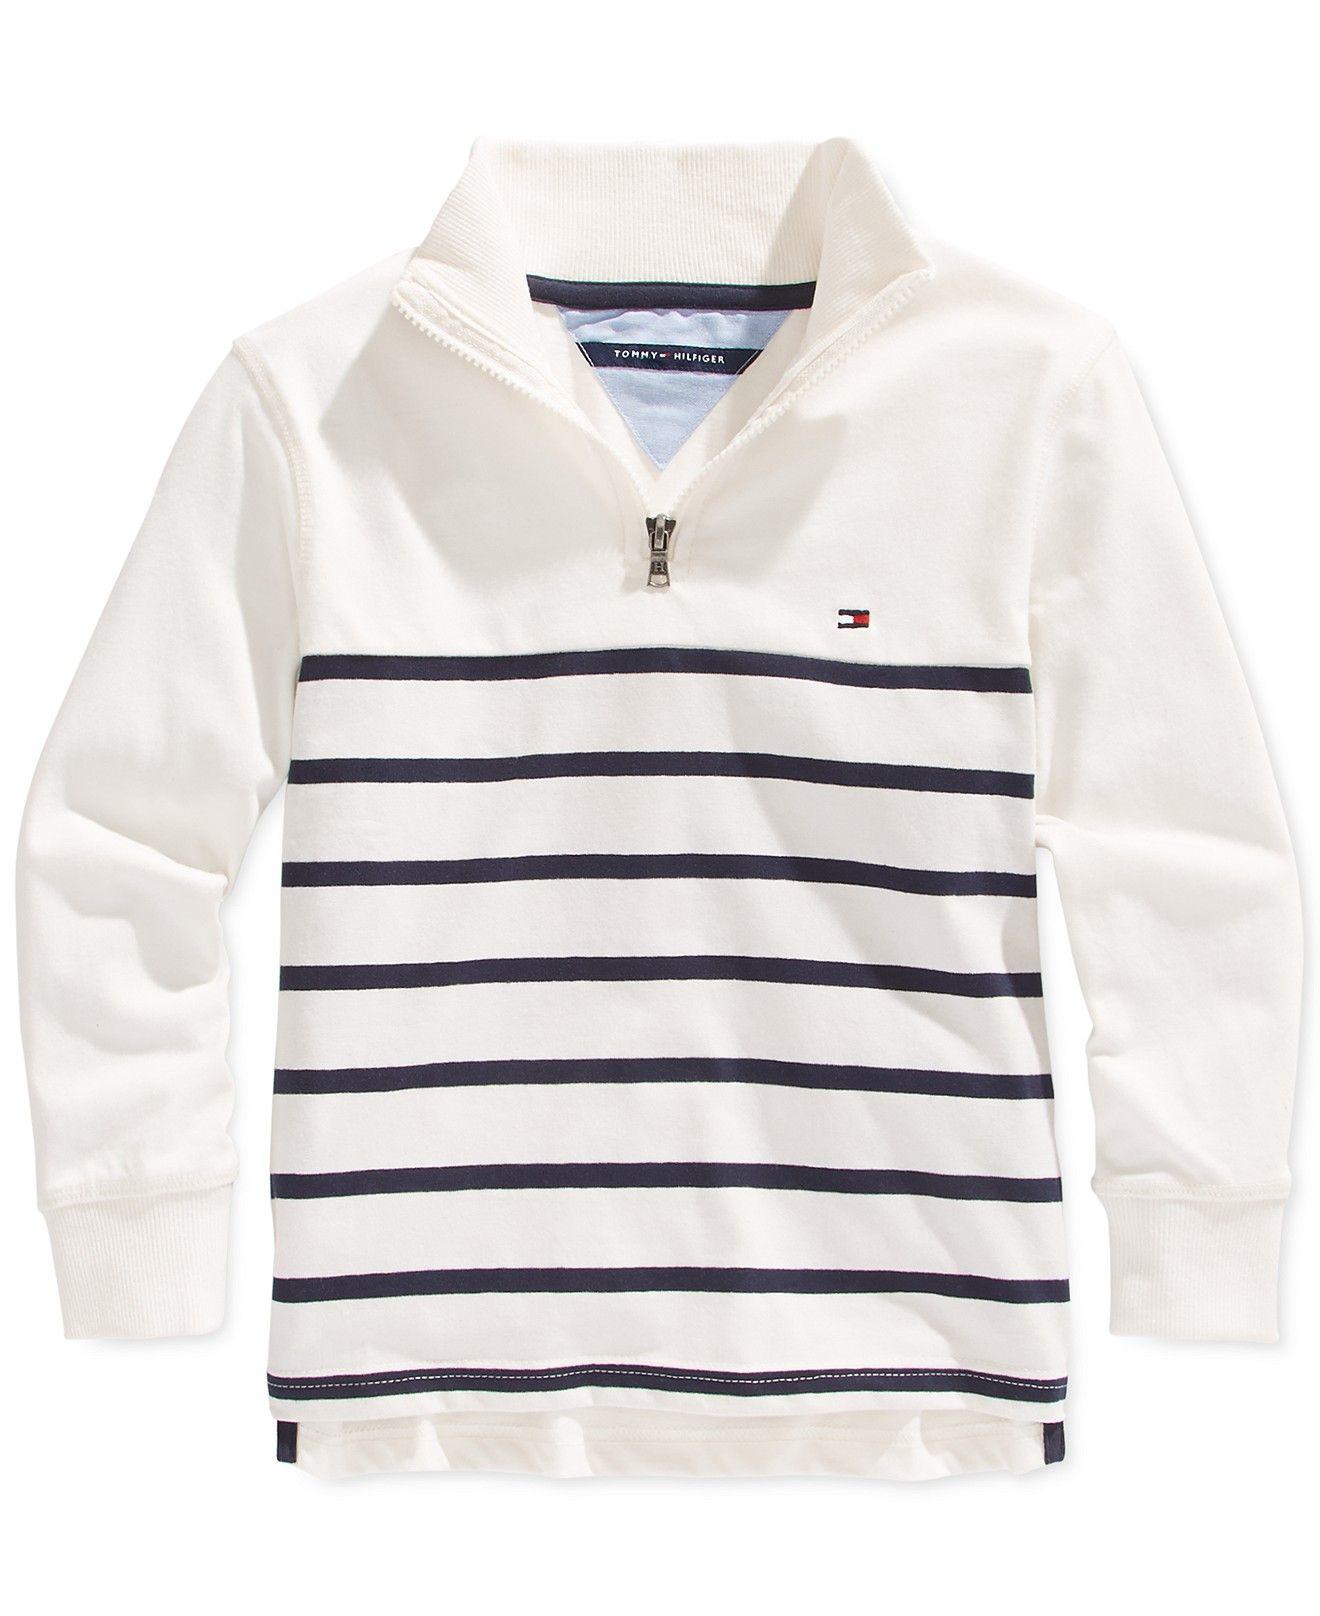 7b413608a Tommy Hilfiger Little Boys' Quarter-Zip Striped Pullover - Kids & Baby -  Macy's